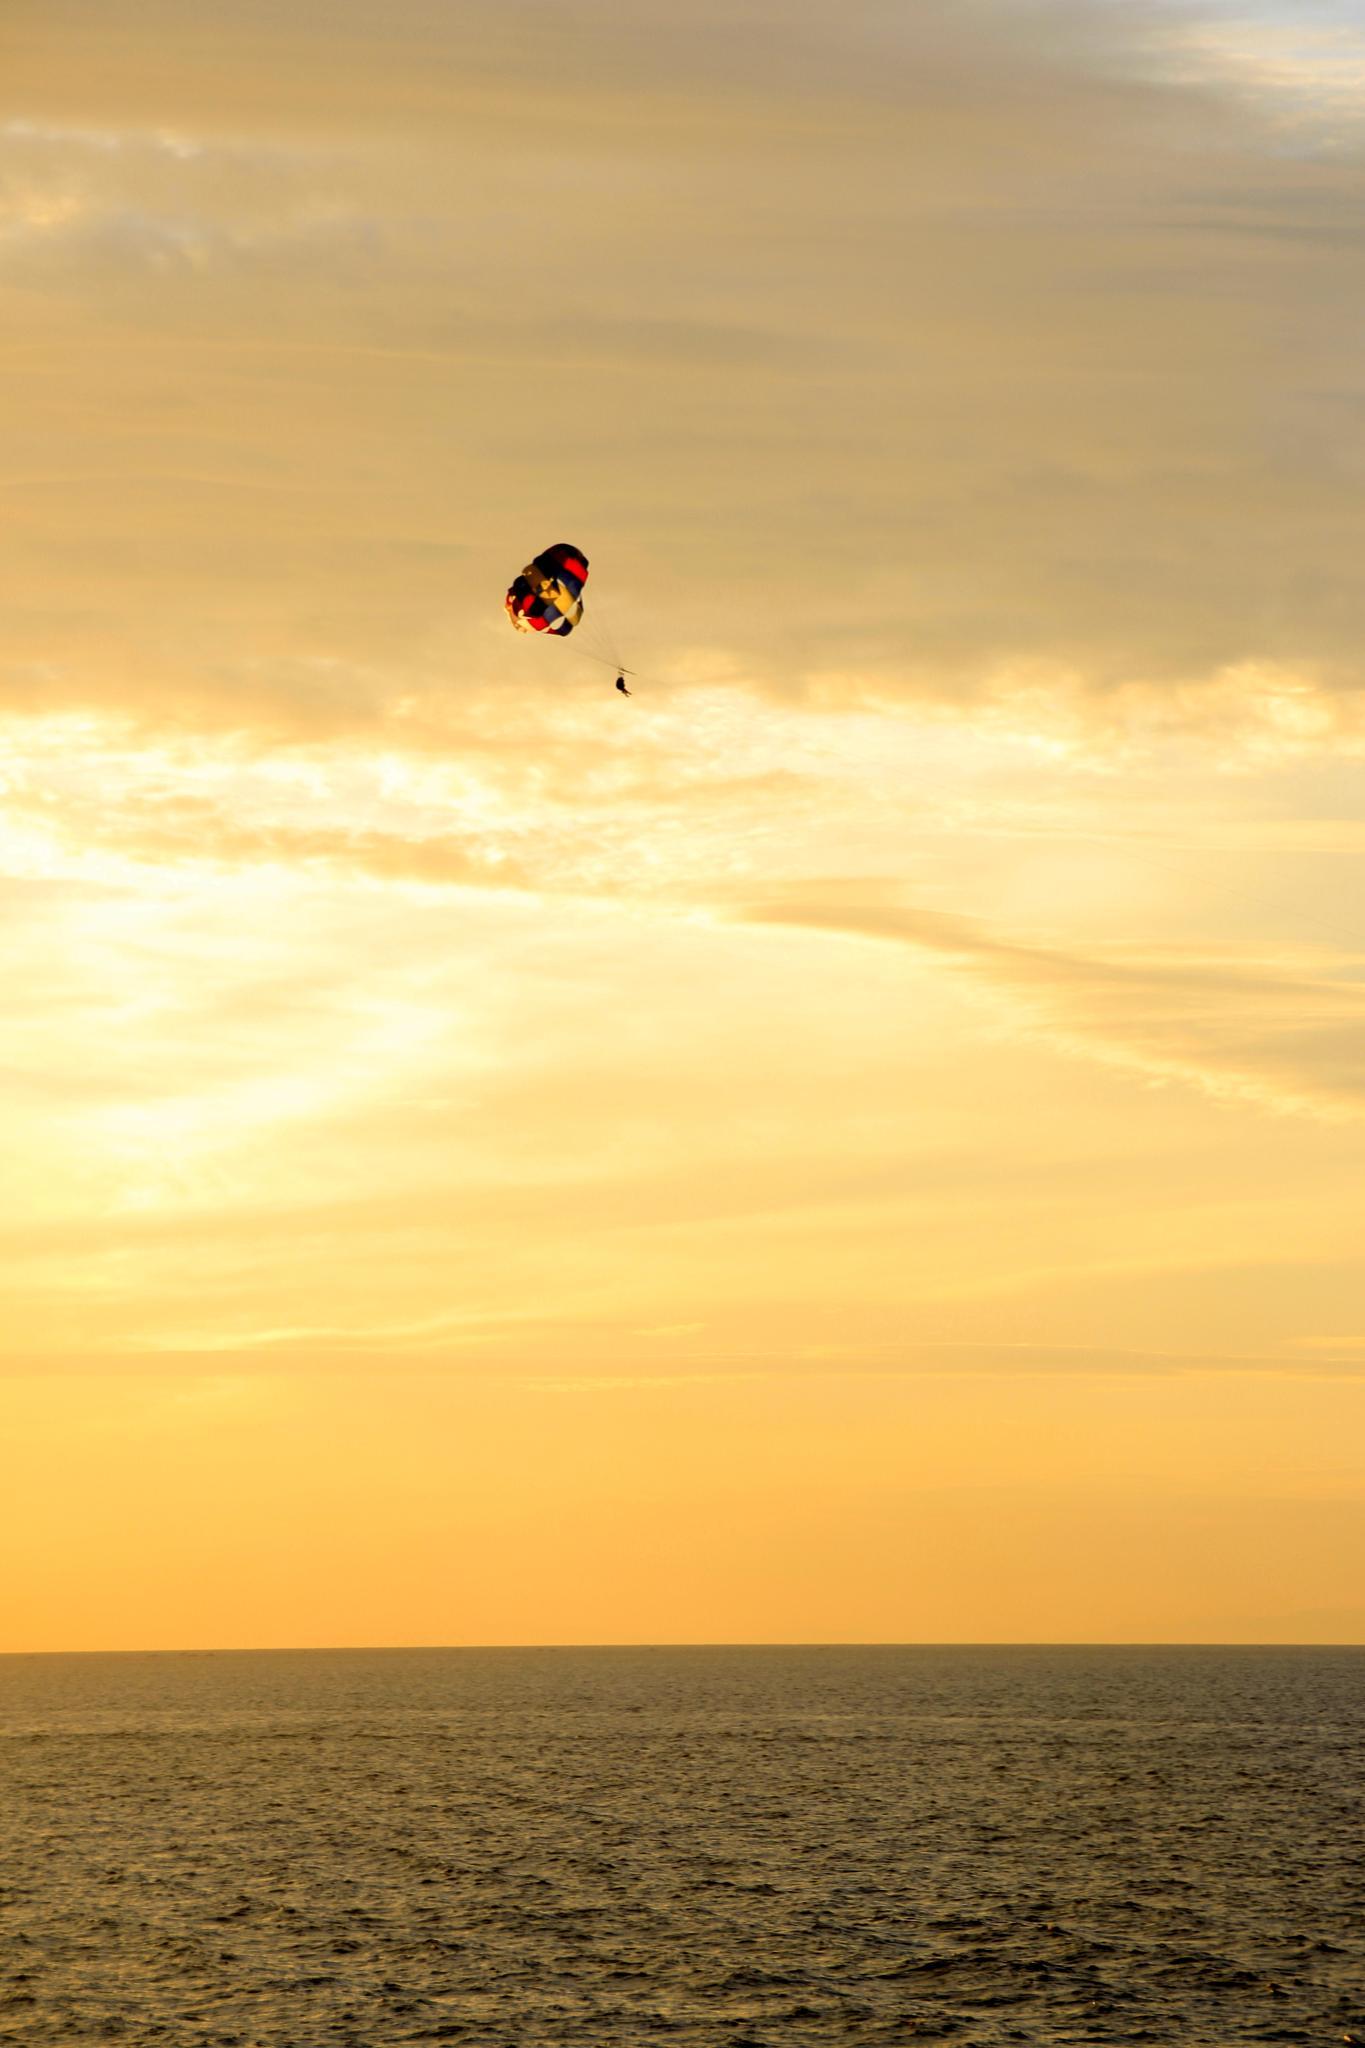 Up up and away by viki mongcal